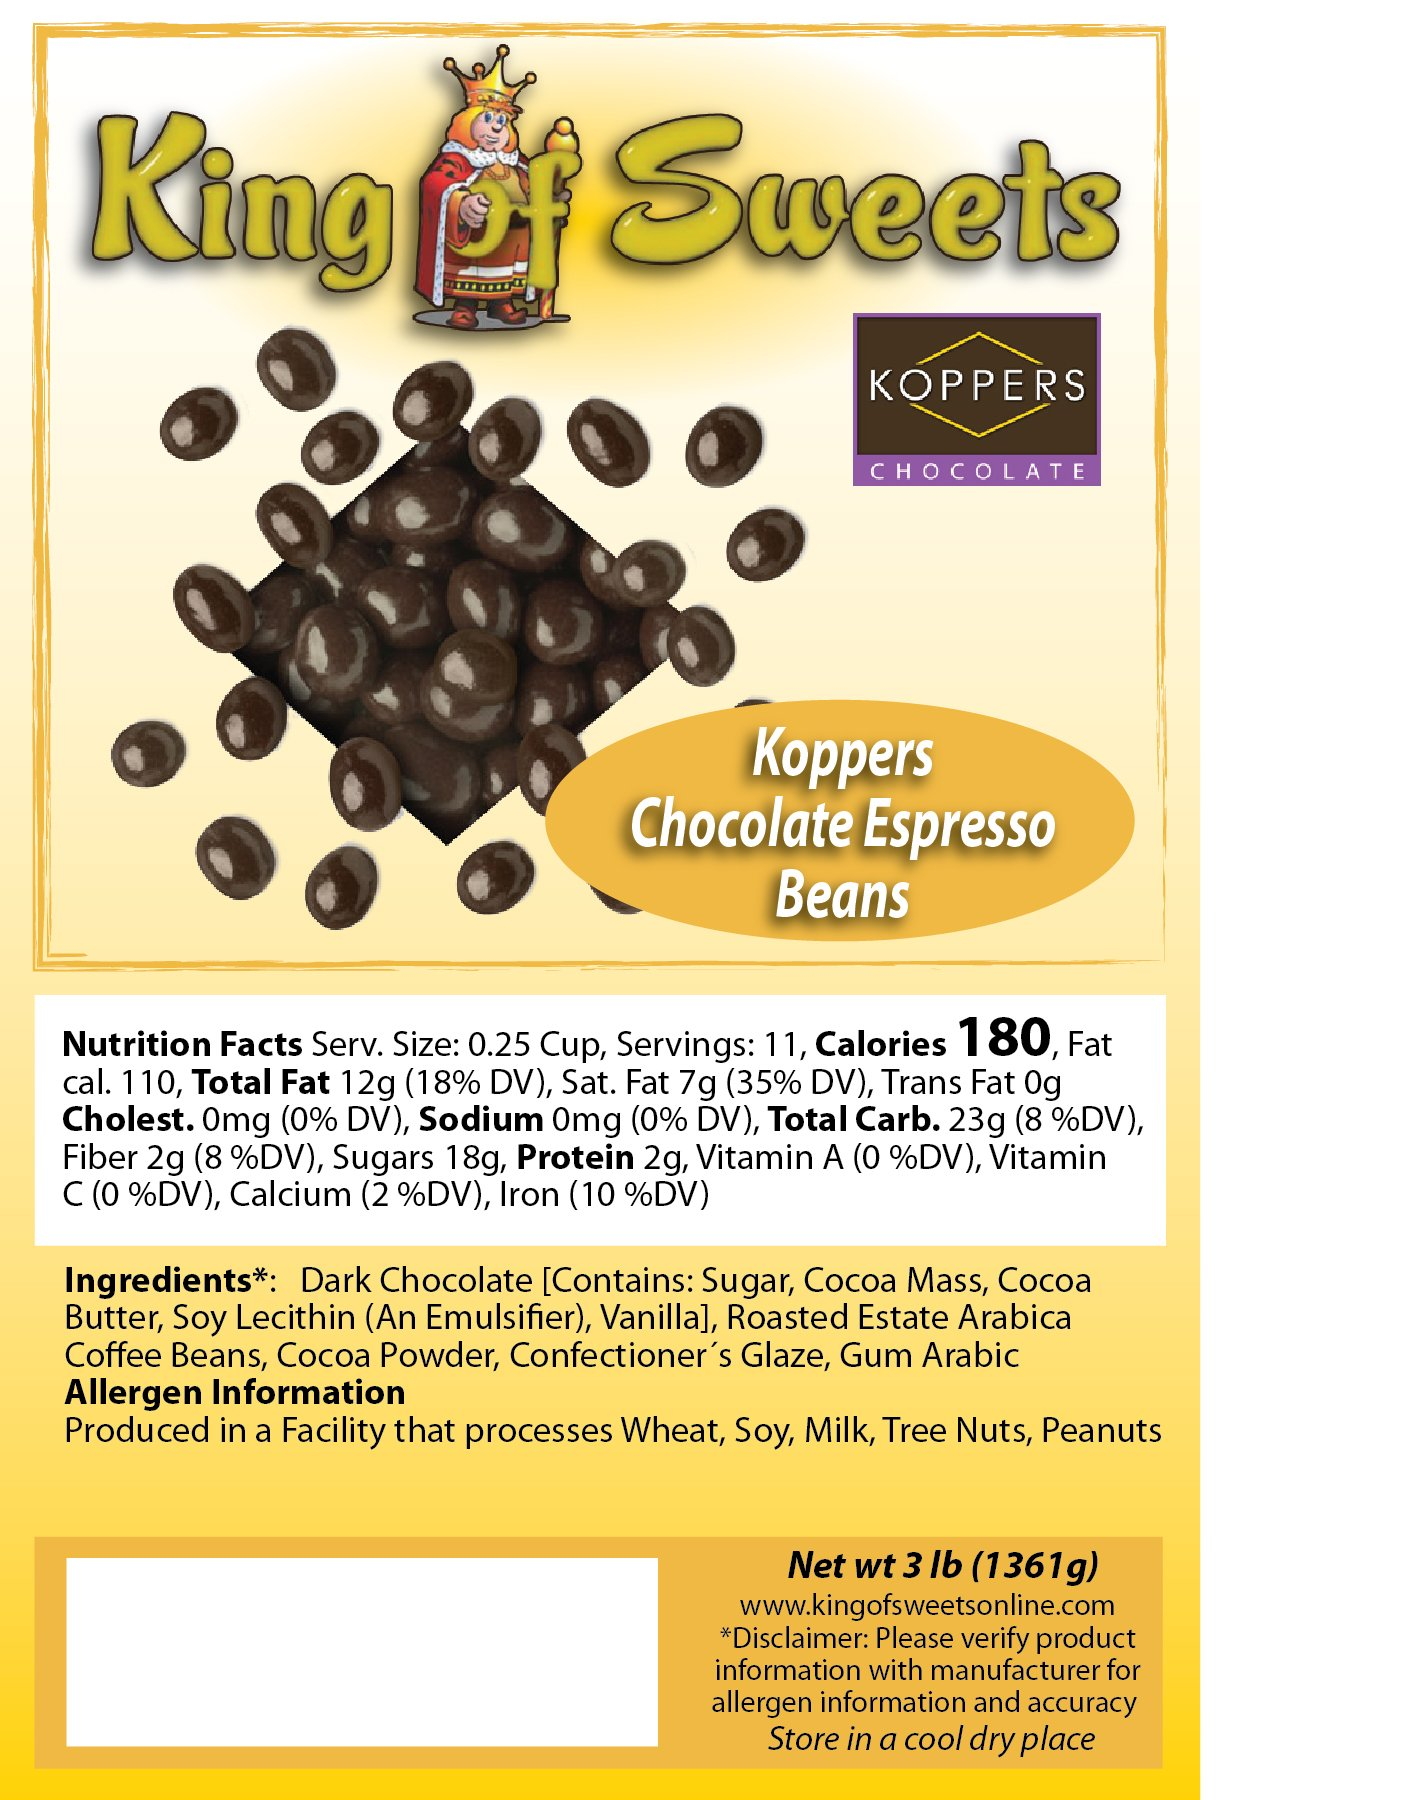 Koppers Chocolate Espresso Beans (3 LB)